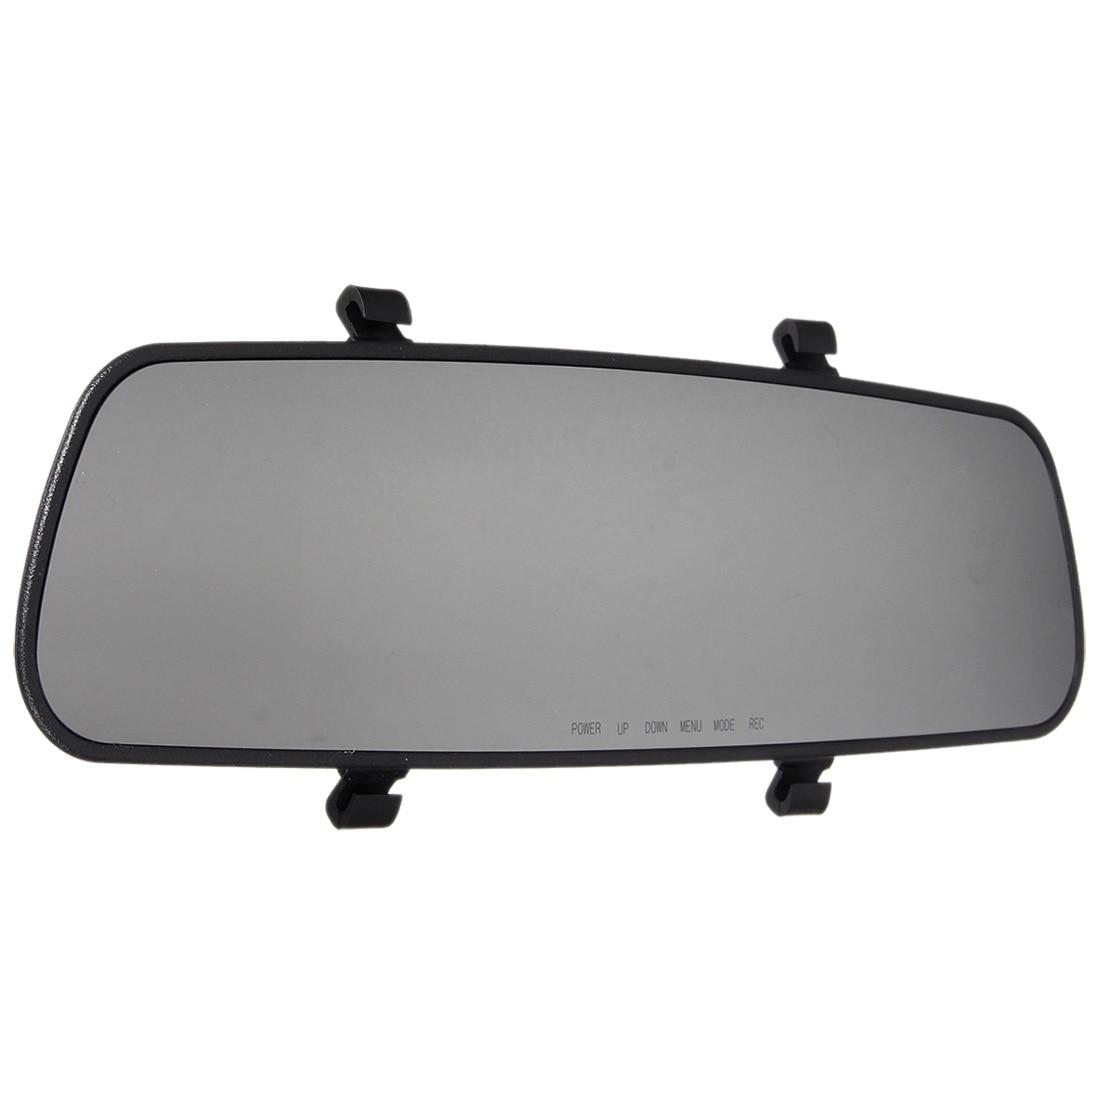 HD Dash Cam Video Recorder Rearview Mirror Car Camera Vehicle DVR Night Vision